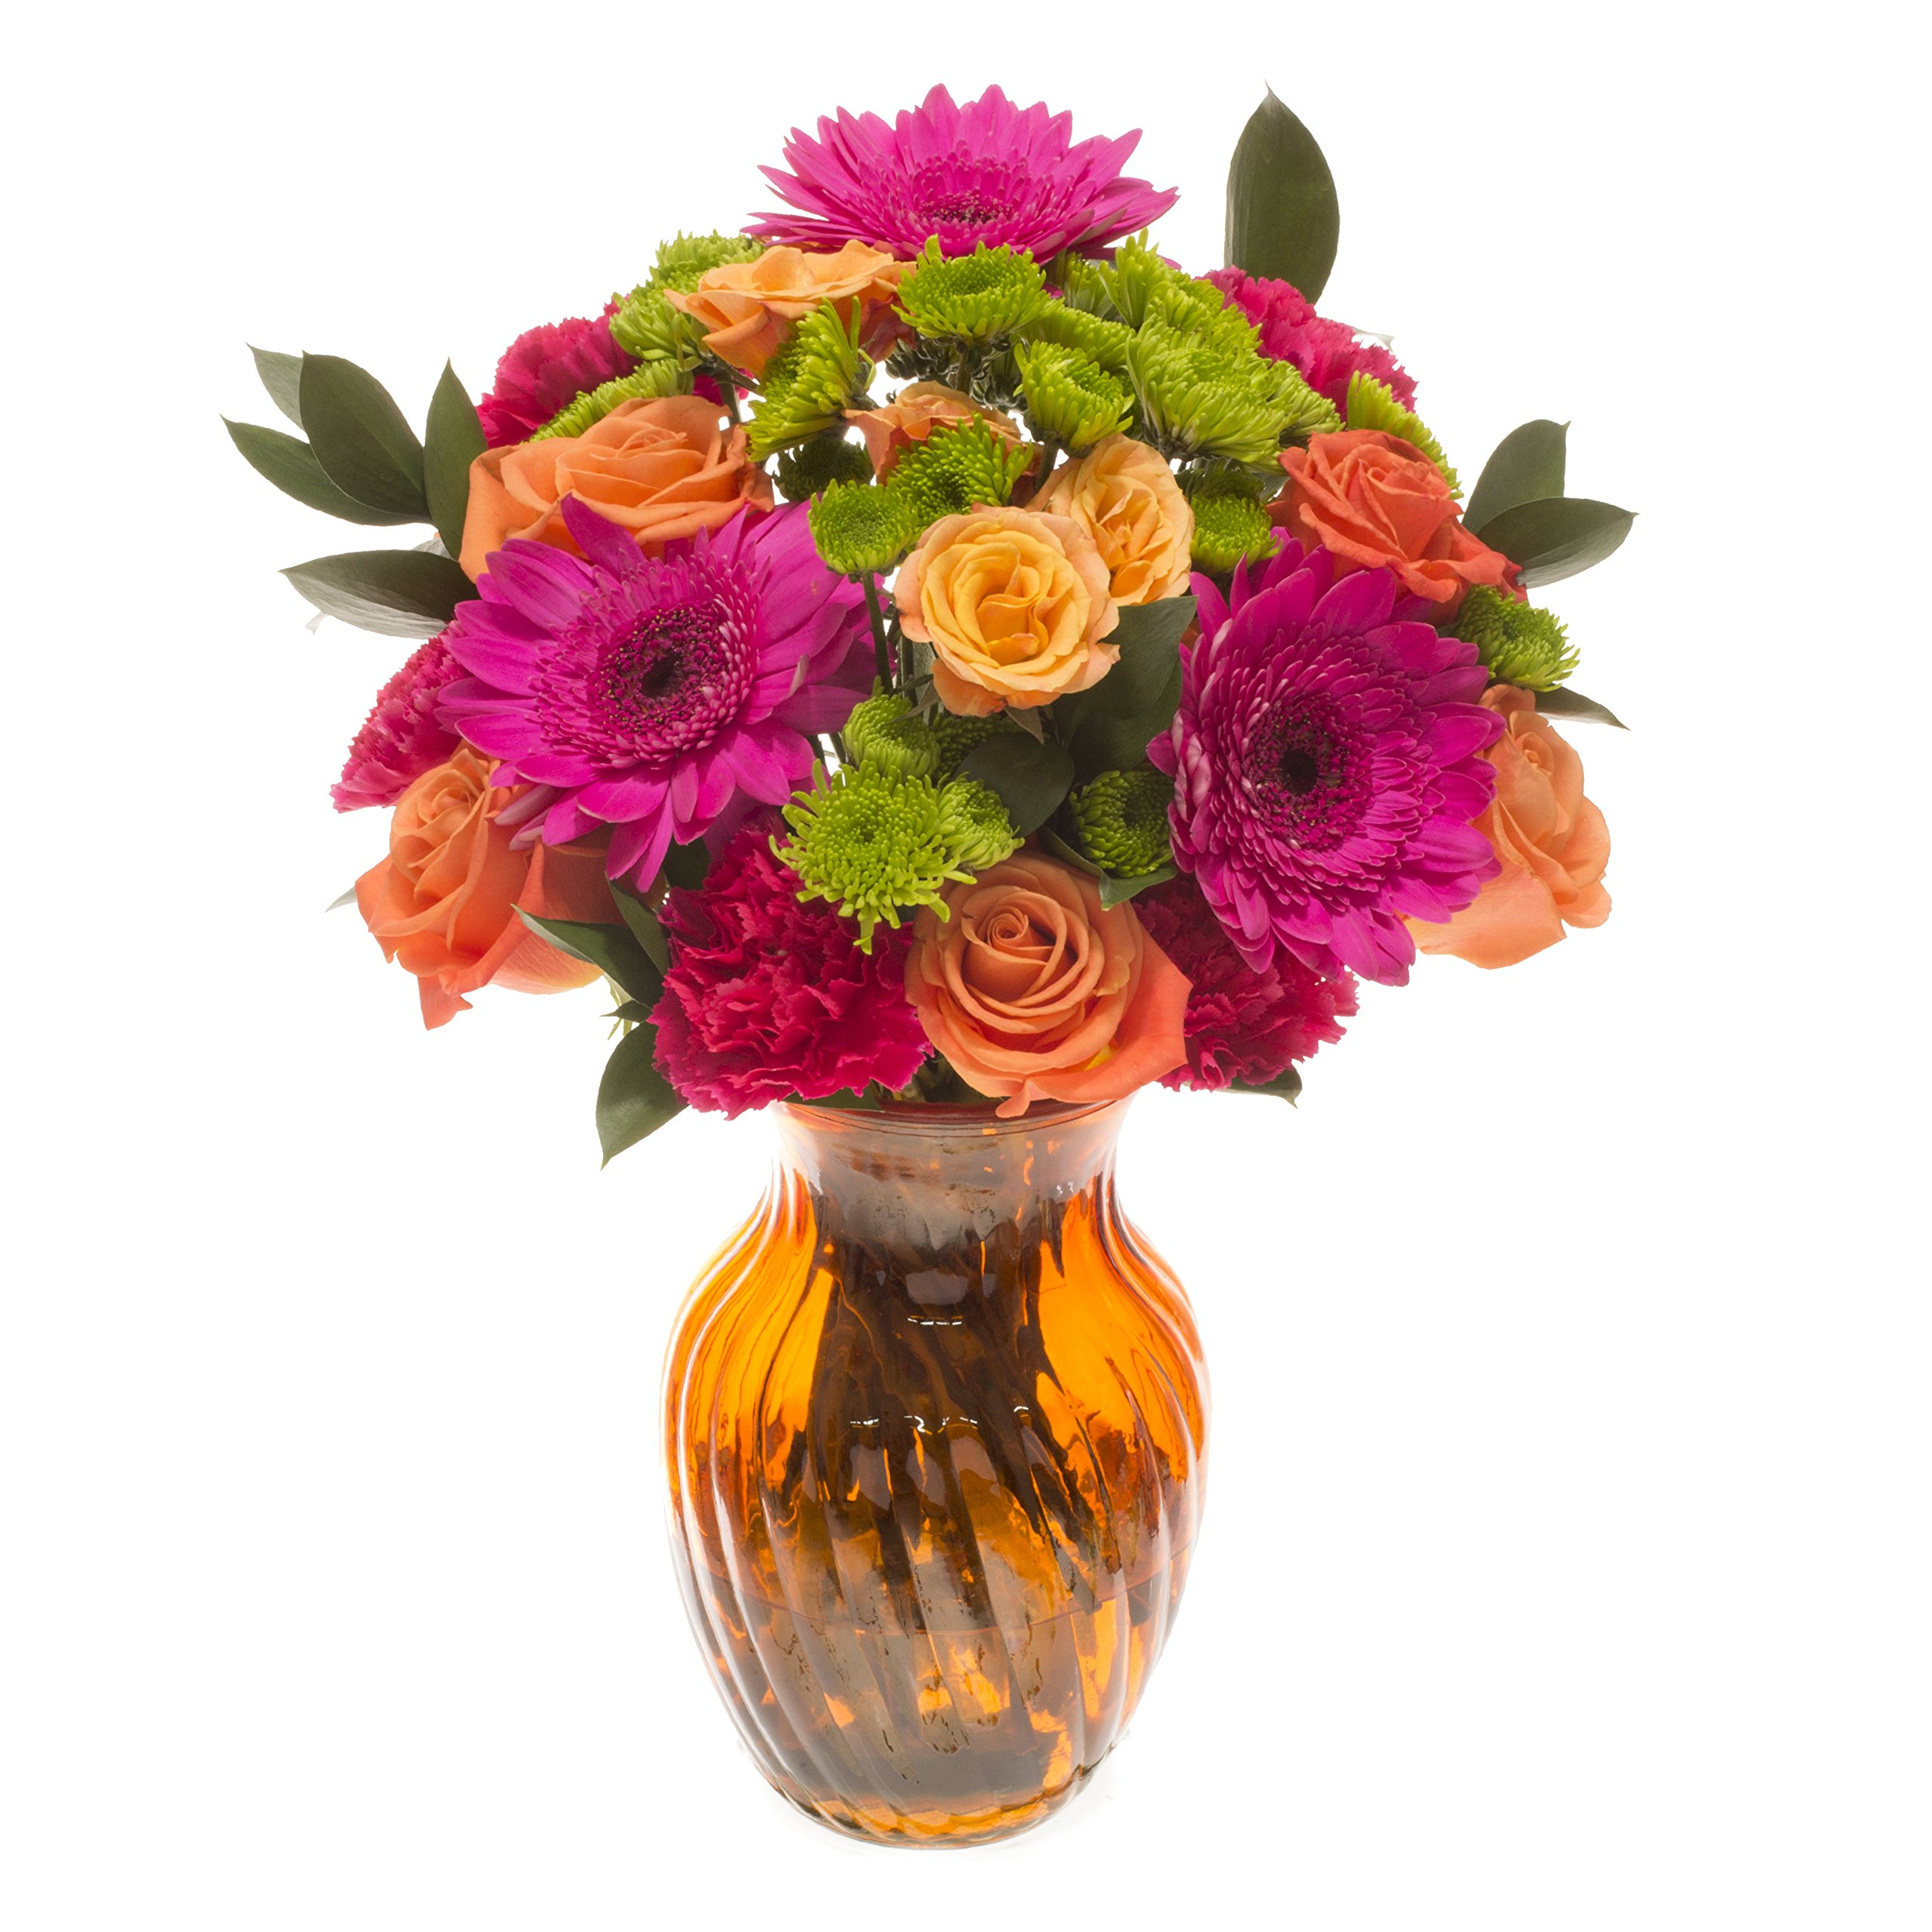 Vistaflor - Summer Colors Floral Vase Arrangement by eFlowy